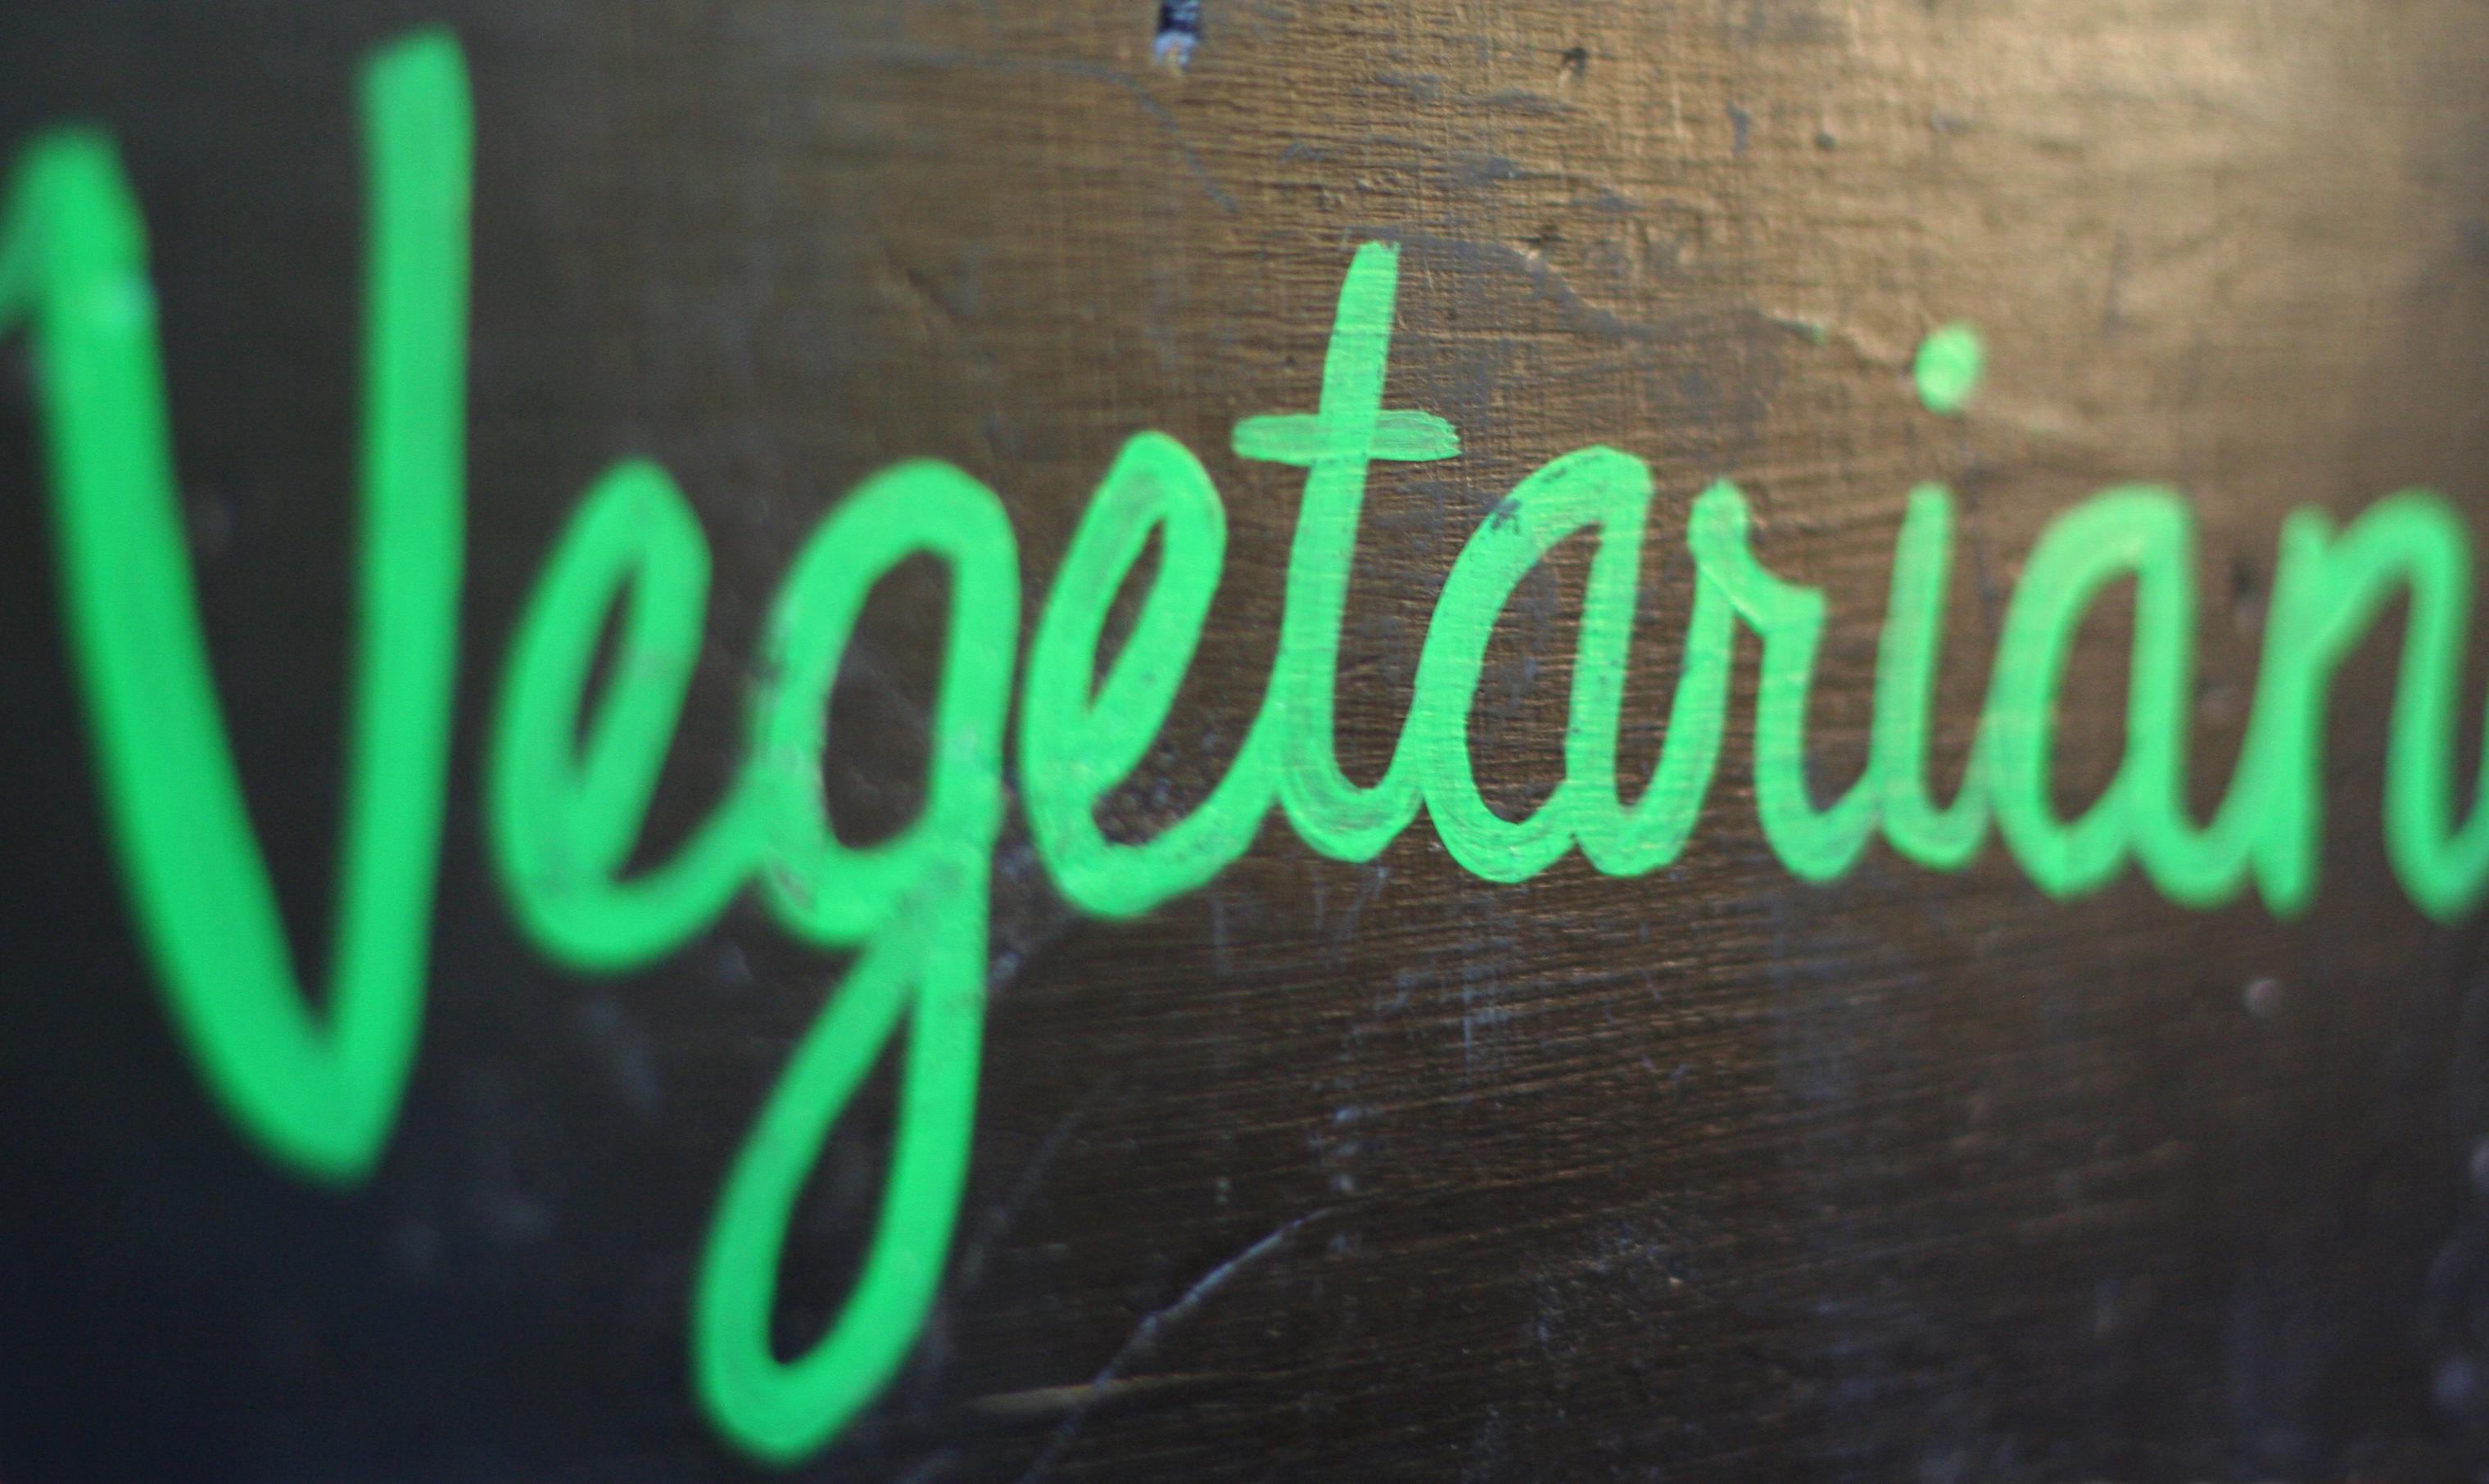 Bohemia Quotes Wallpaper August Vegetarian